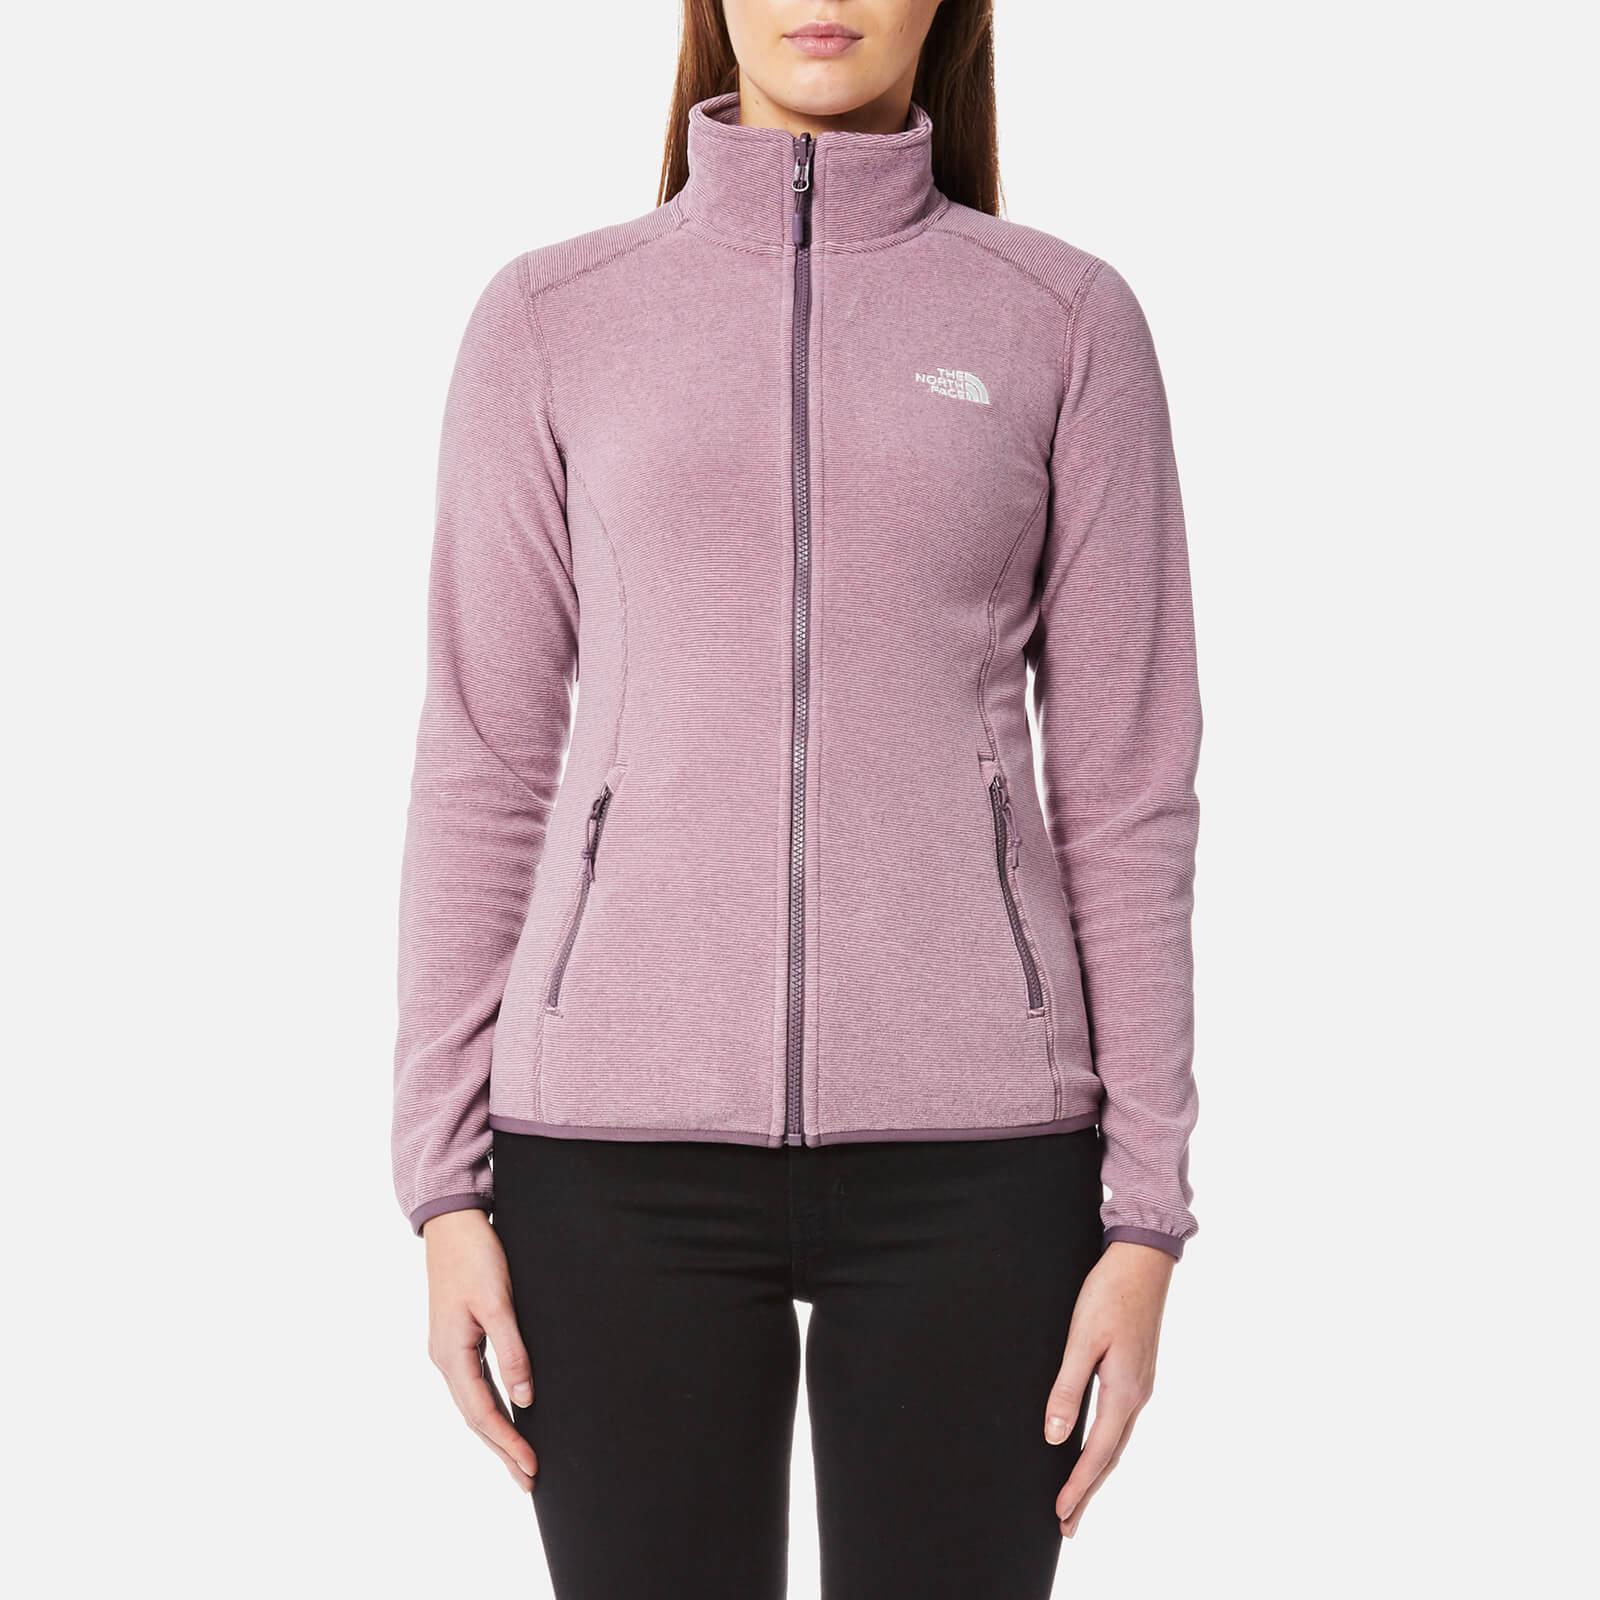 d581d7927e9a The North Face Women s 100 Glacier Full Zip Fleece Jumper - Black Plum  Stripe Womens Clothing